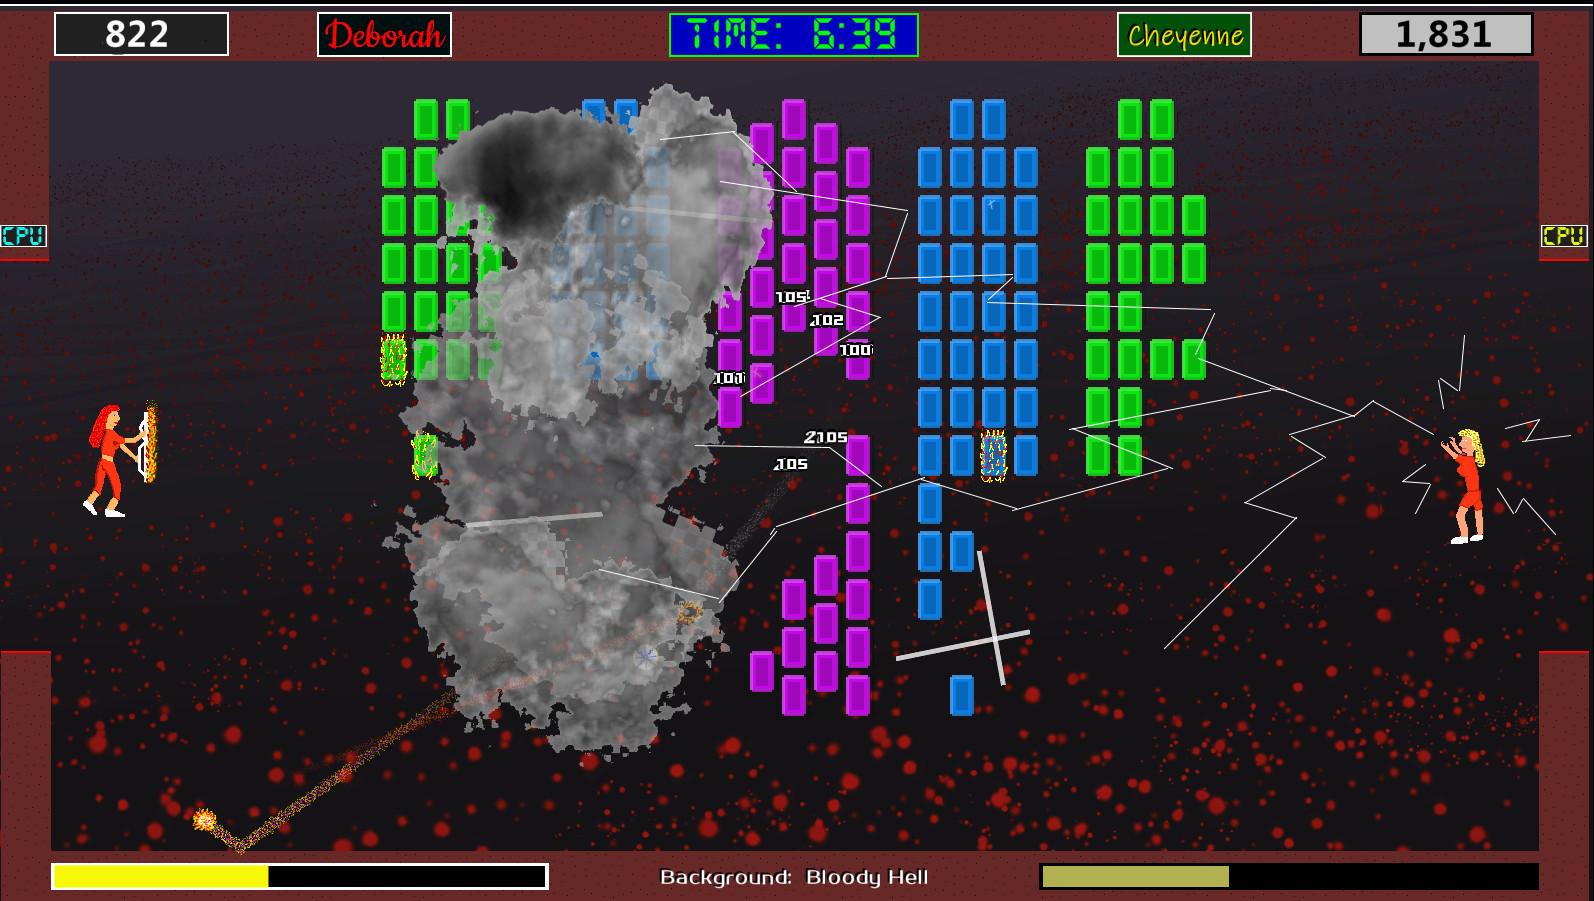 Prison Ball - Playable Character: Cheyenne Storm screenshot